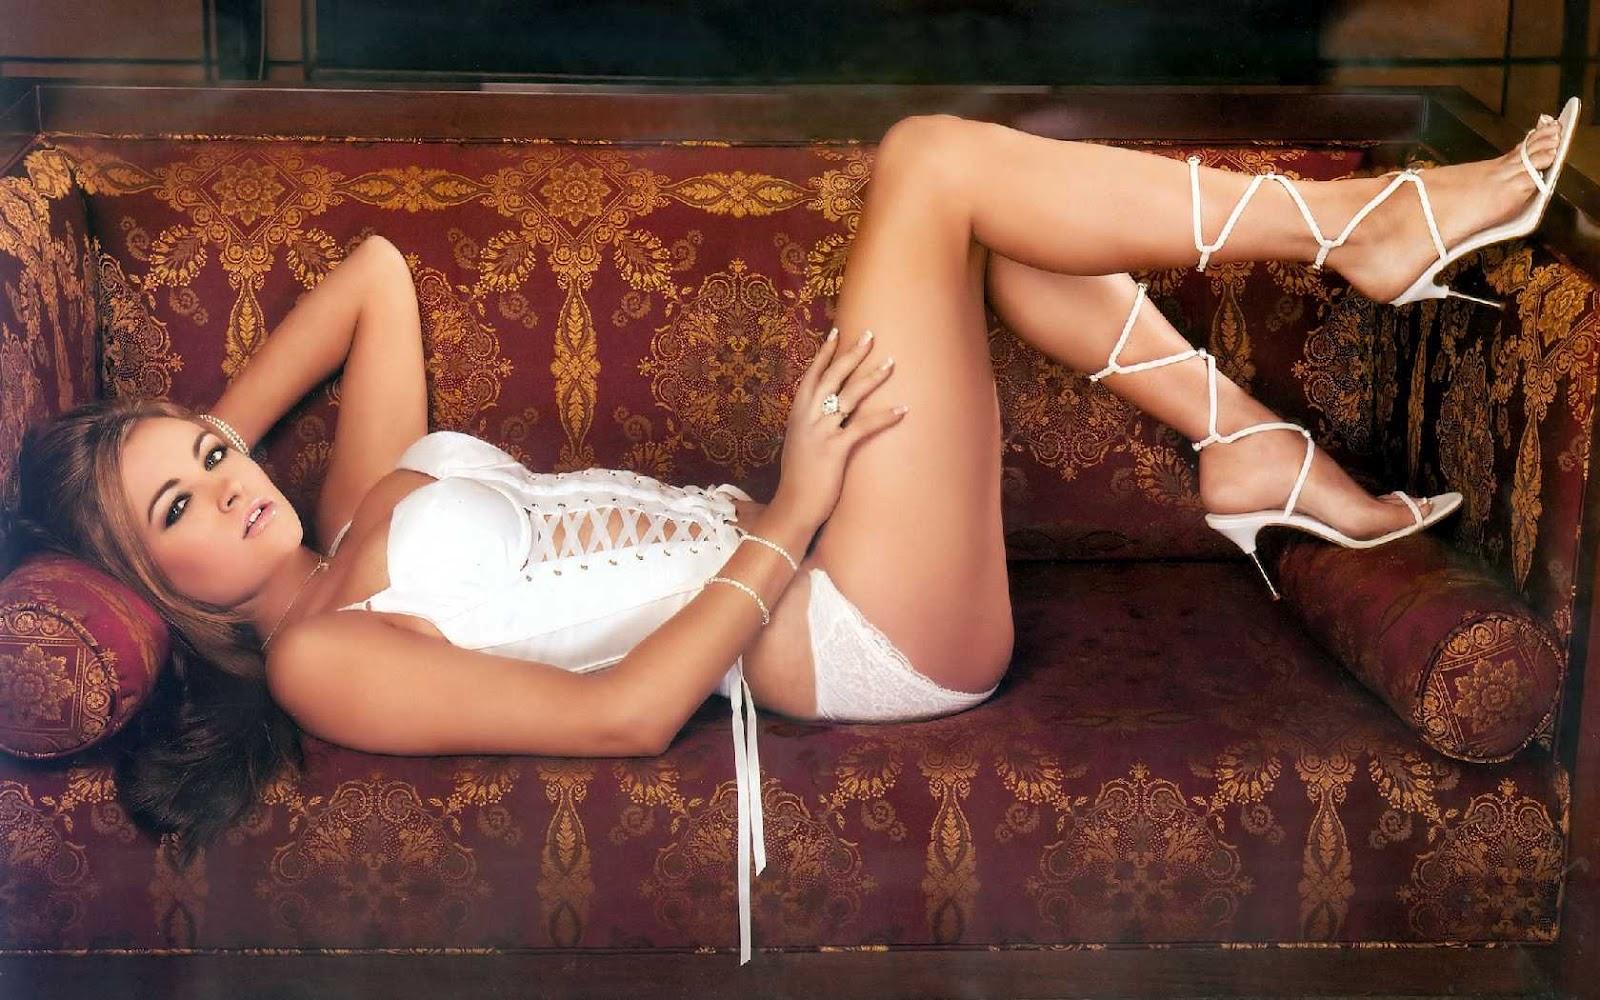 http://3.bp.blogspot.com/-JXwjRwiqGRw/T9HUs66xNkI/AAAAAAAACVs/8teDXNvQpbk/s1600/WWE+Maria+Kanellis+hd+Wallpapers+2012_5.jpg